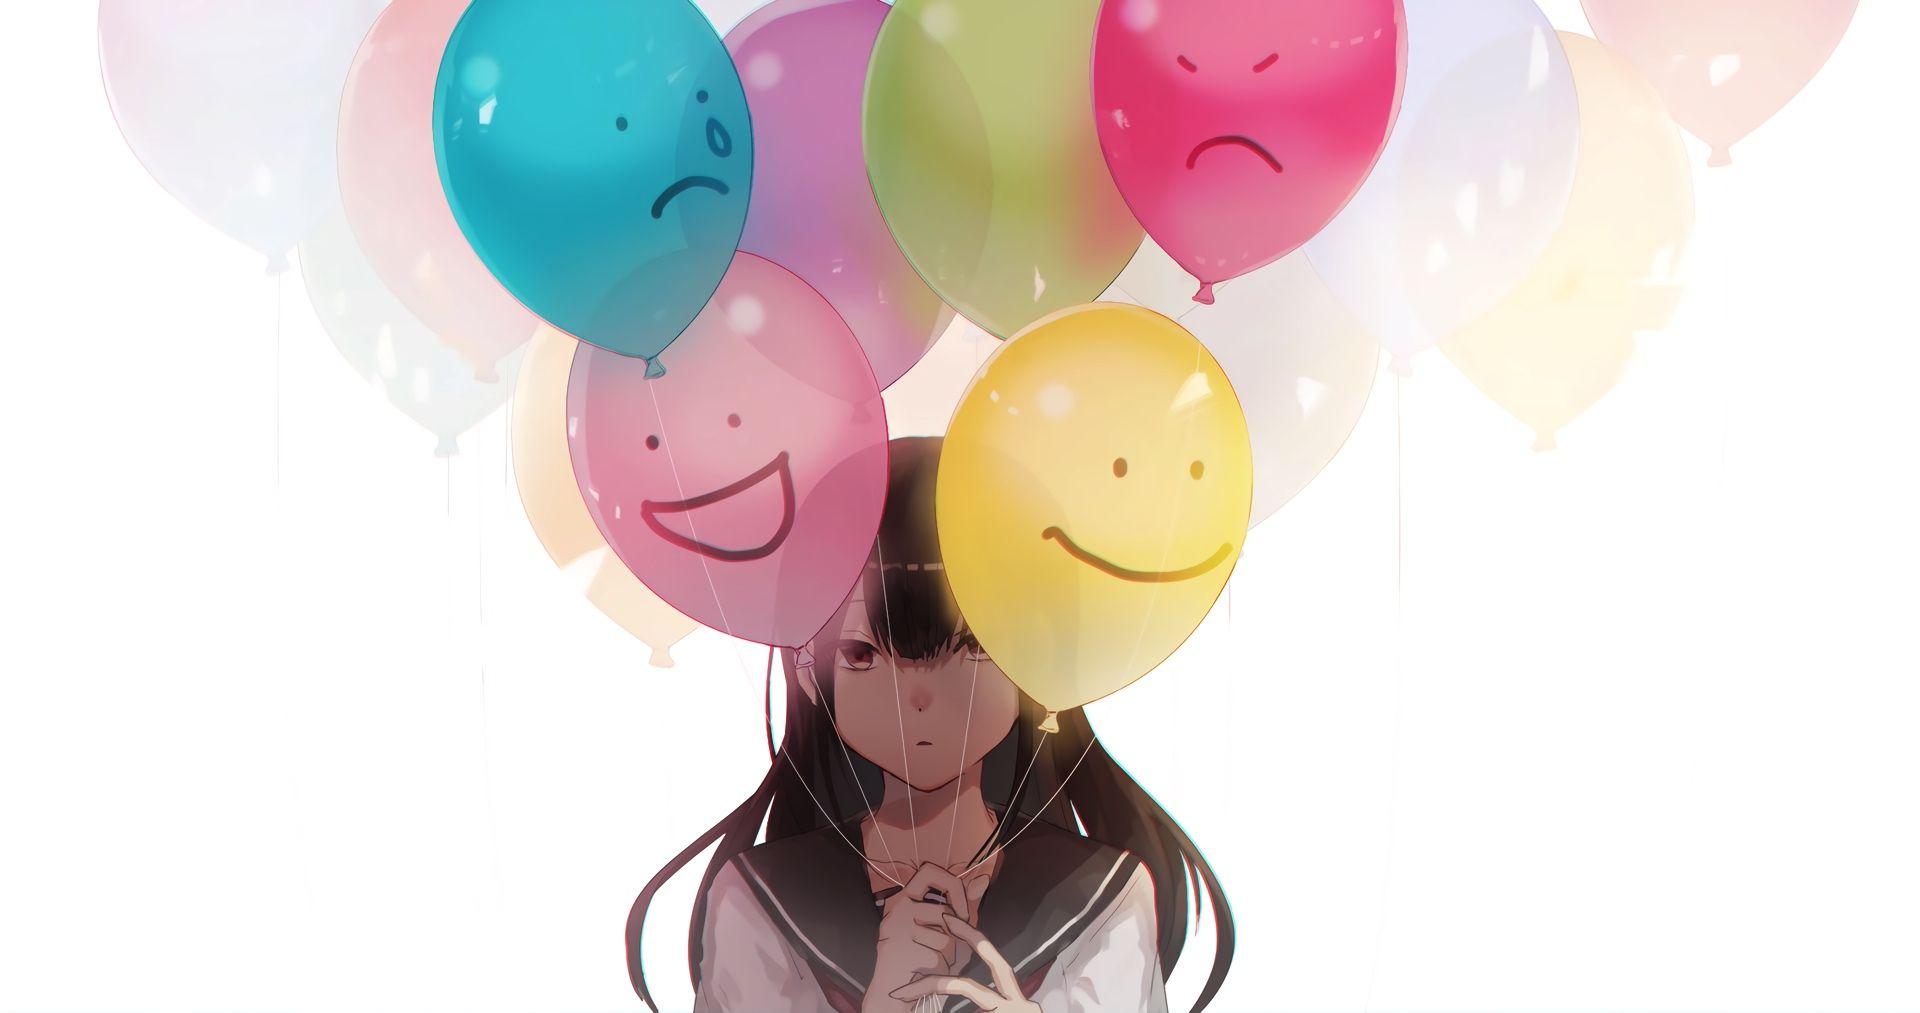 Desktop Wallpaper Sad Anime Girl Colorful Balloons Original Hd